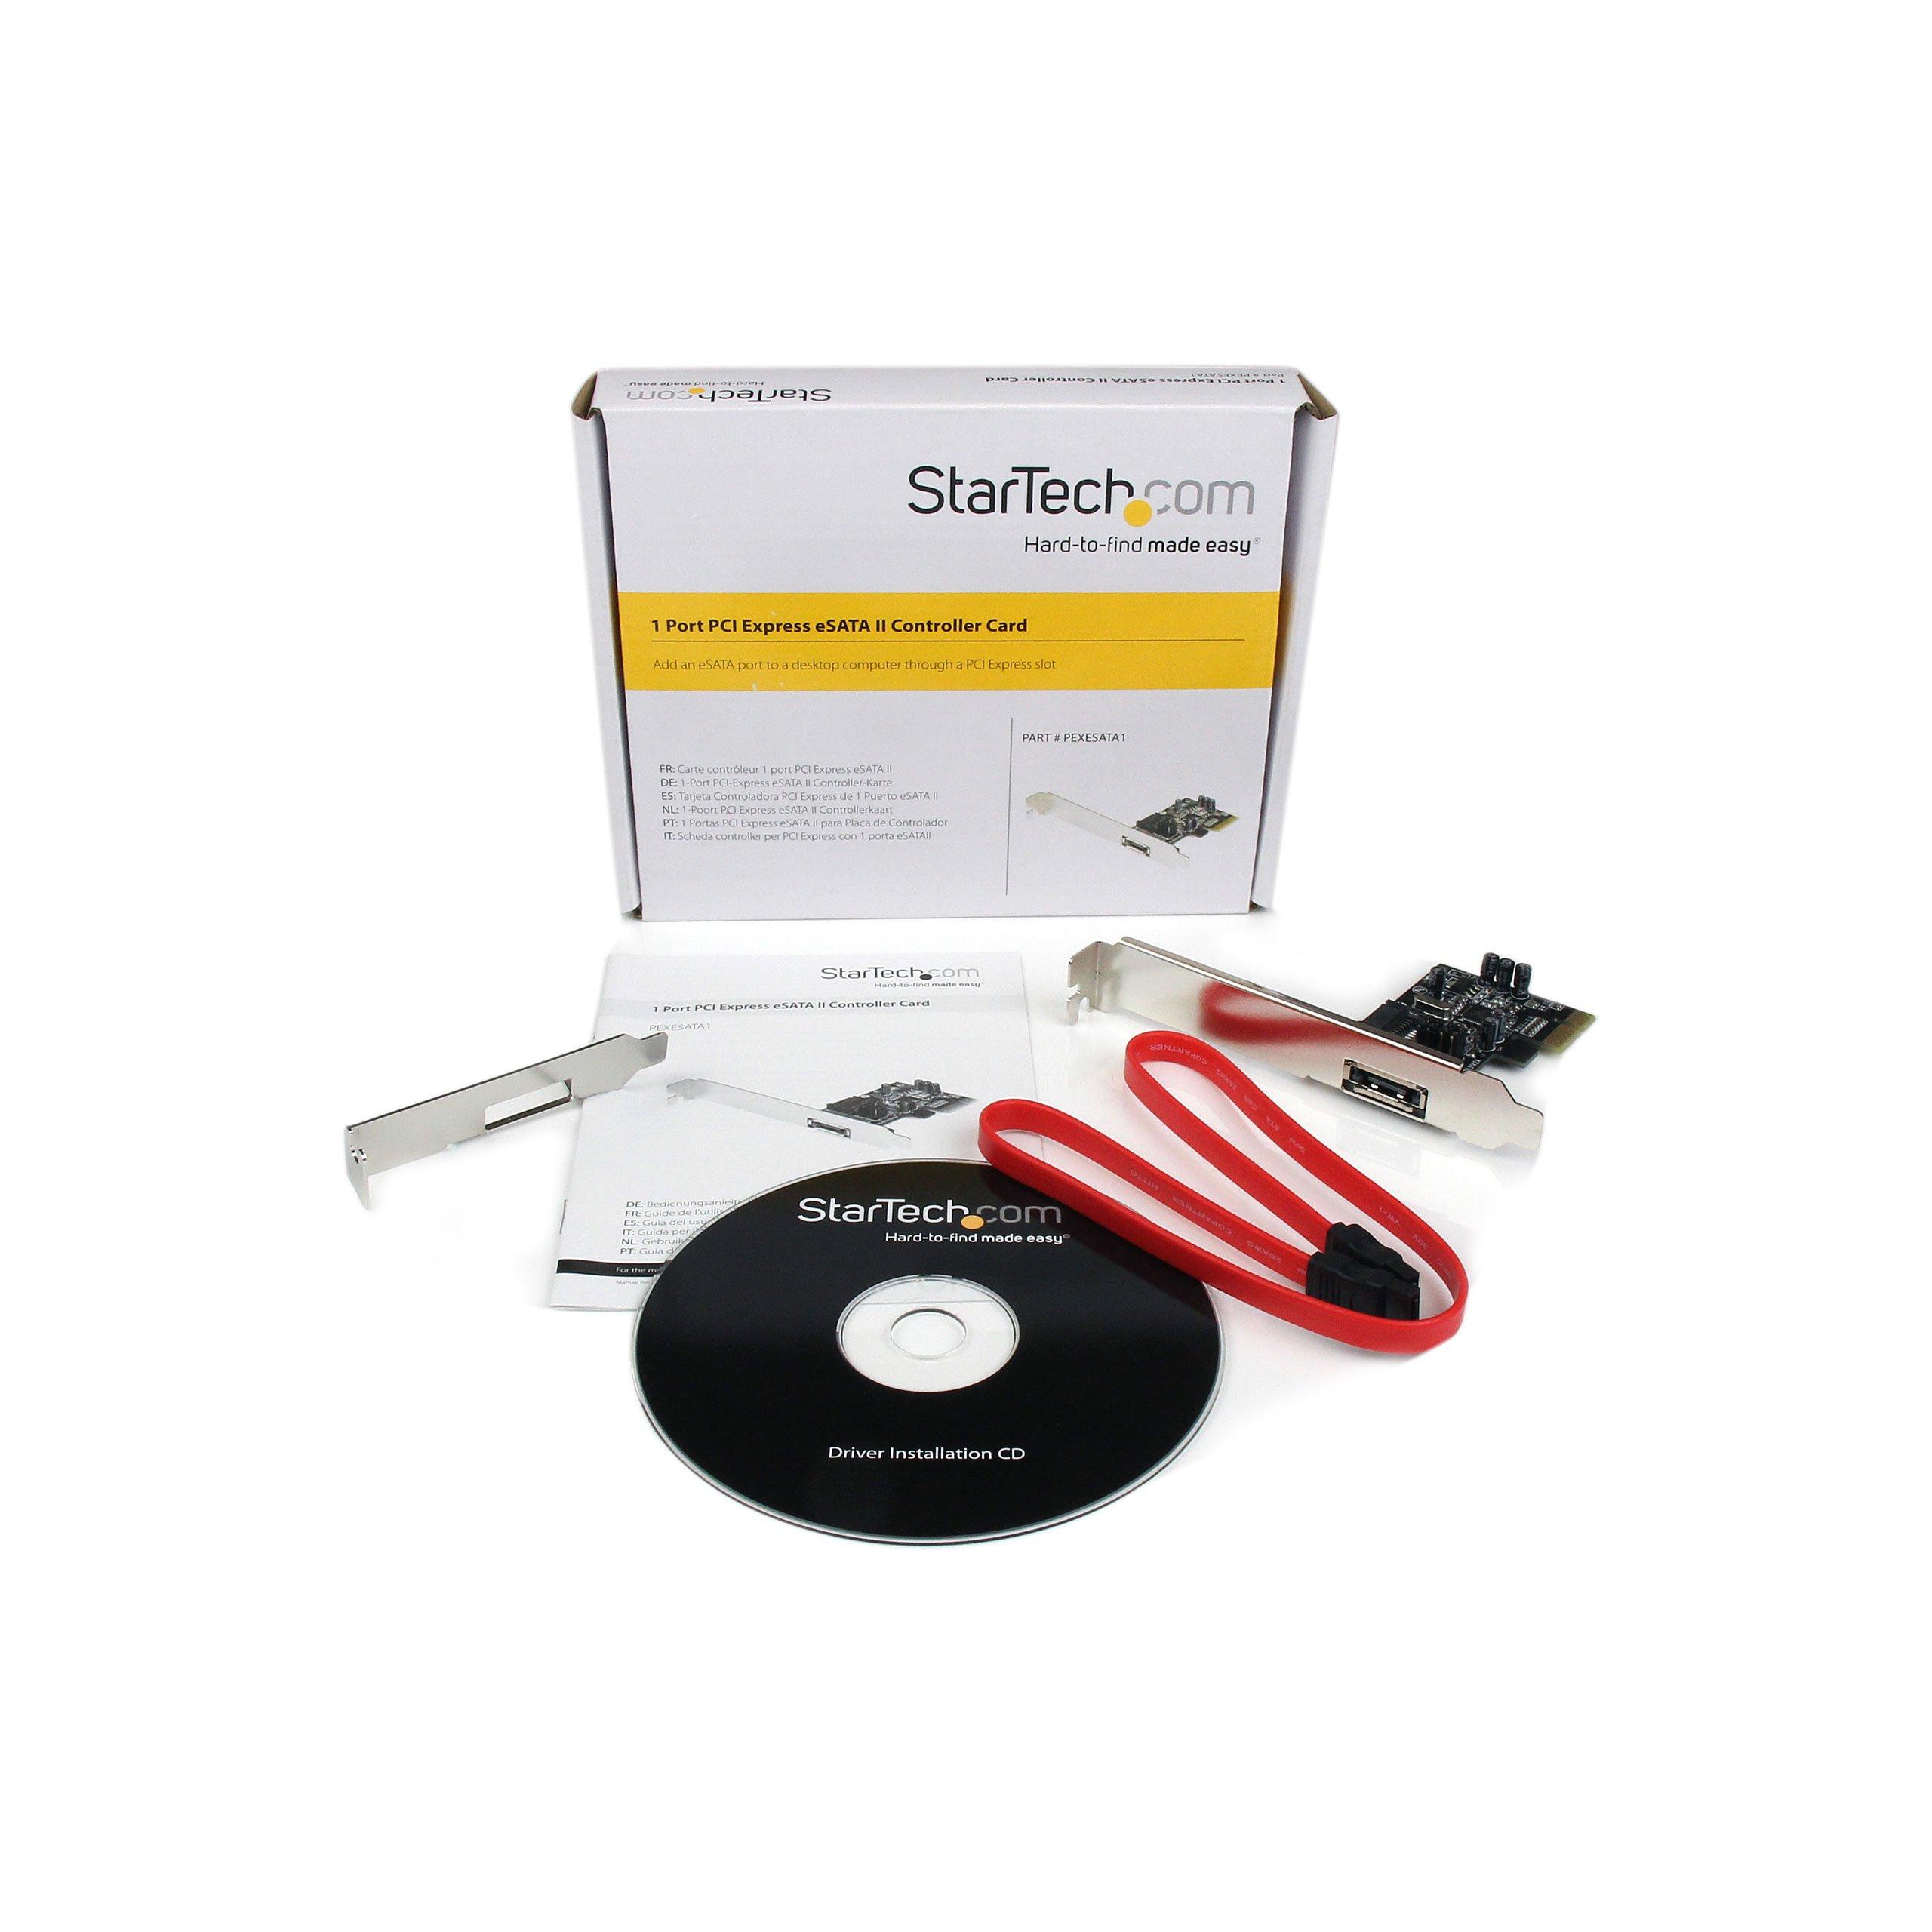 StarTech.com 1 Port PCI Express eSATA II Controller Card PEXESATA1 by StarTech (Image #4)